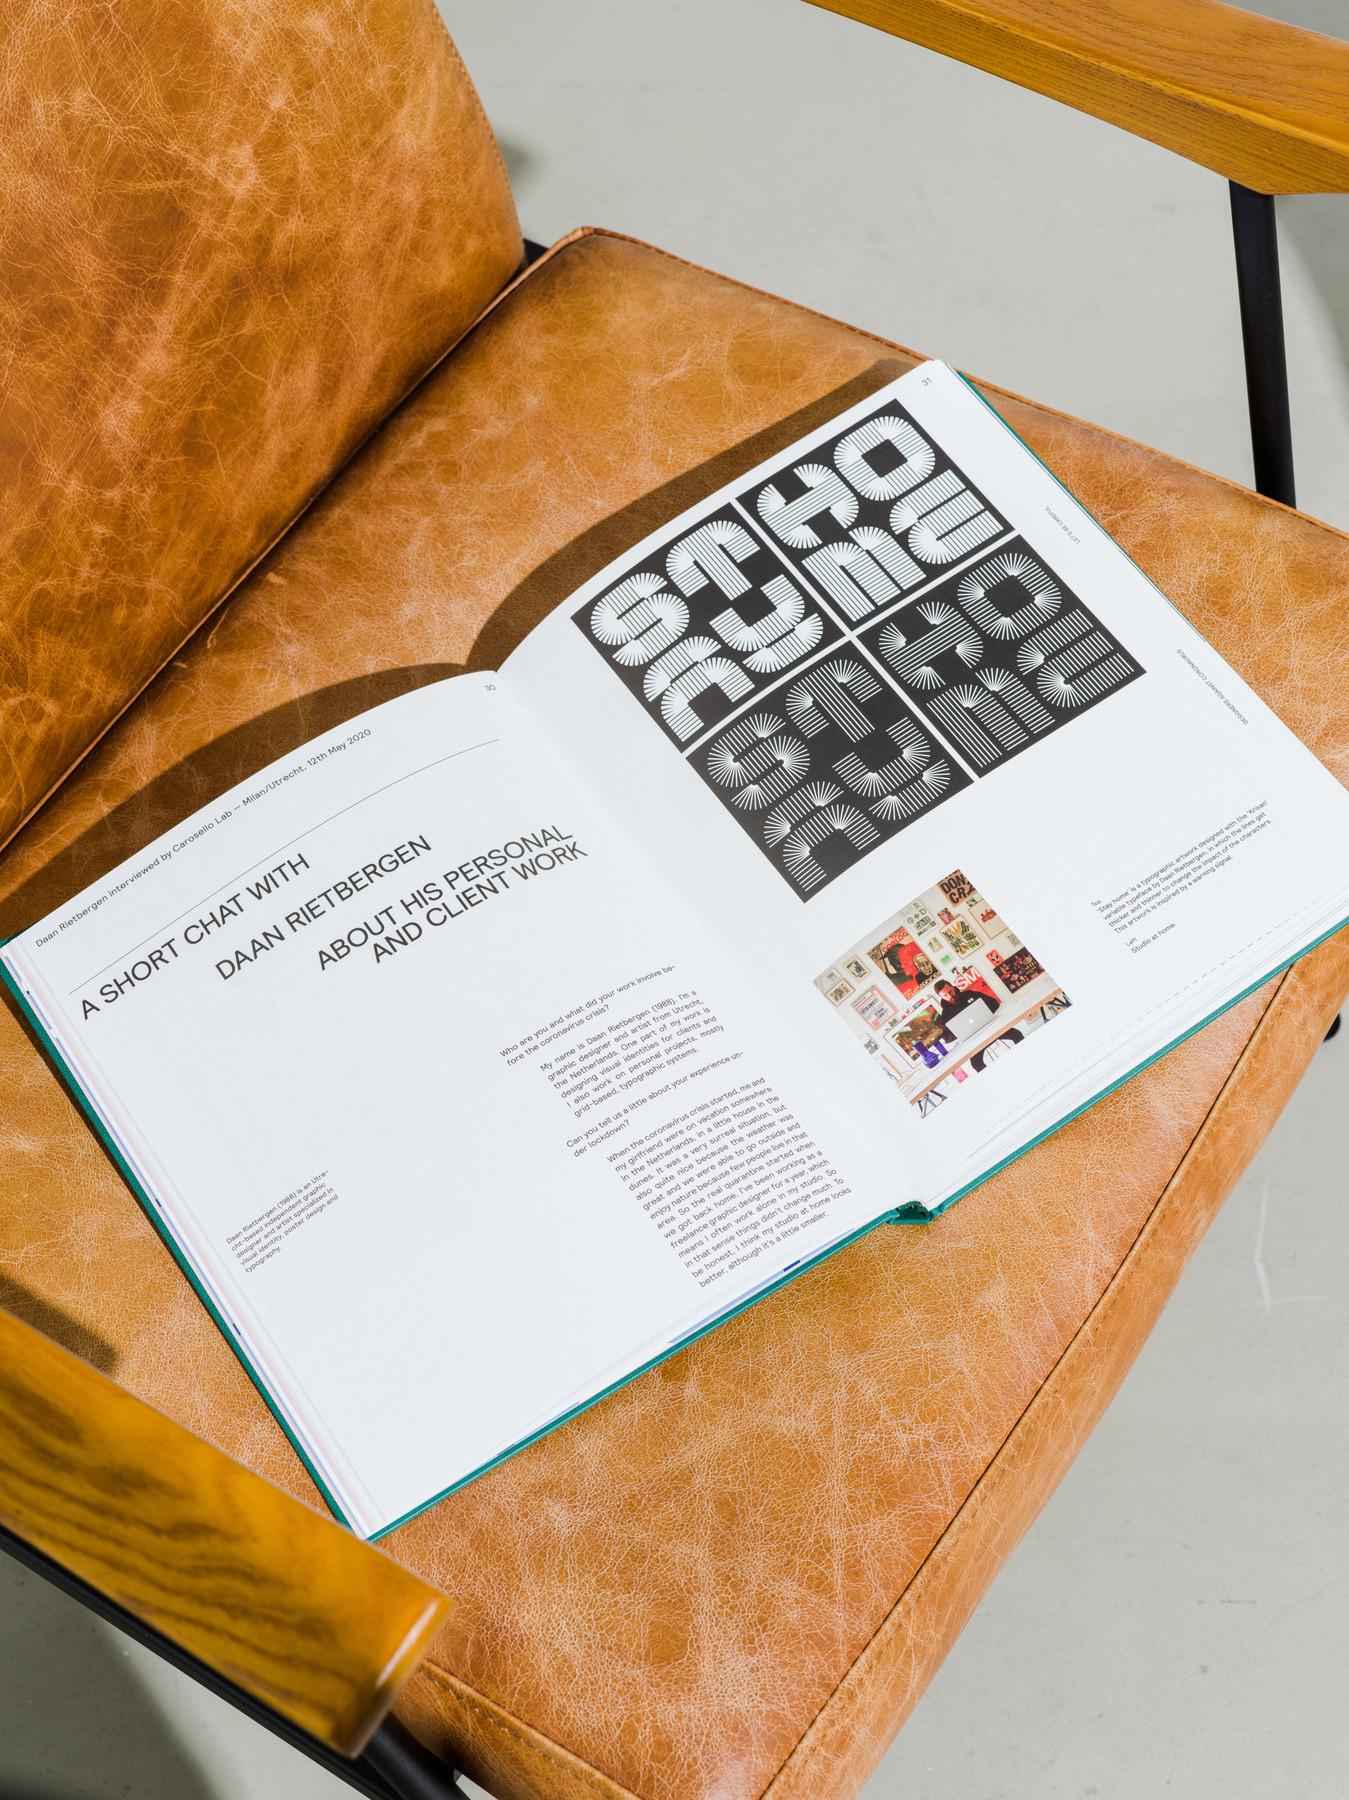 DAC Book CaroselloLab 042